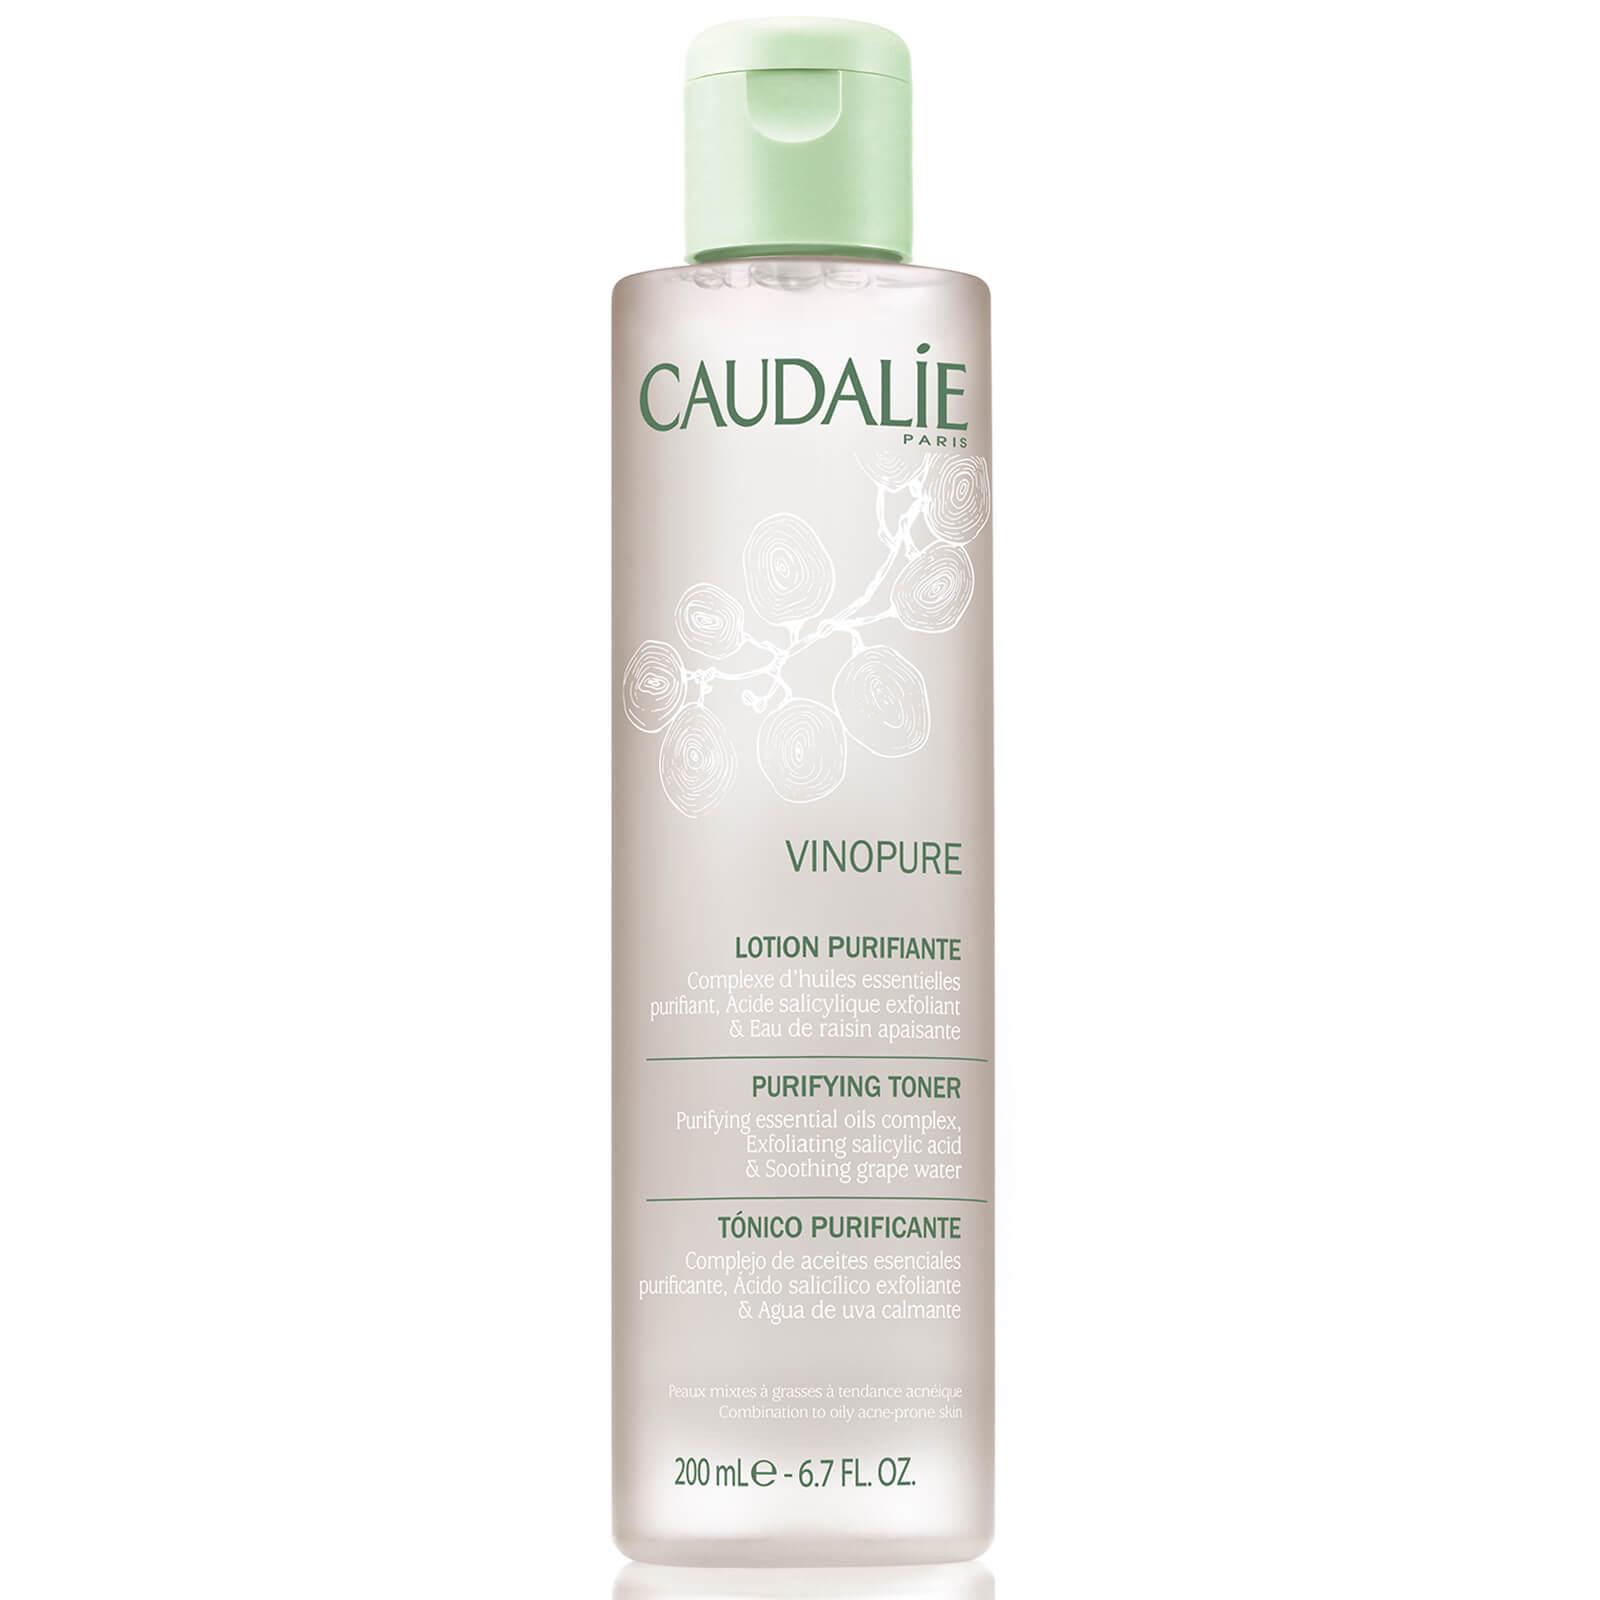 Caudalie - Vinopure Clear Skin Purifying Toner 200 ml